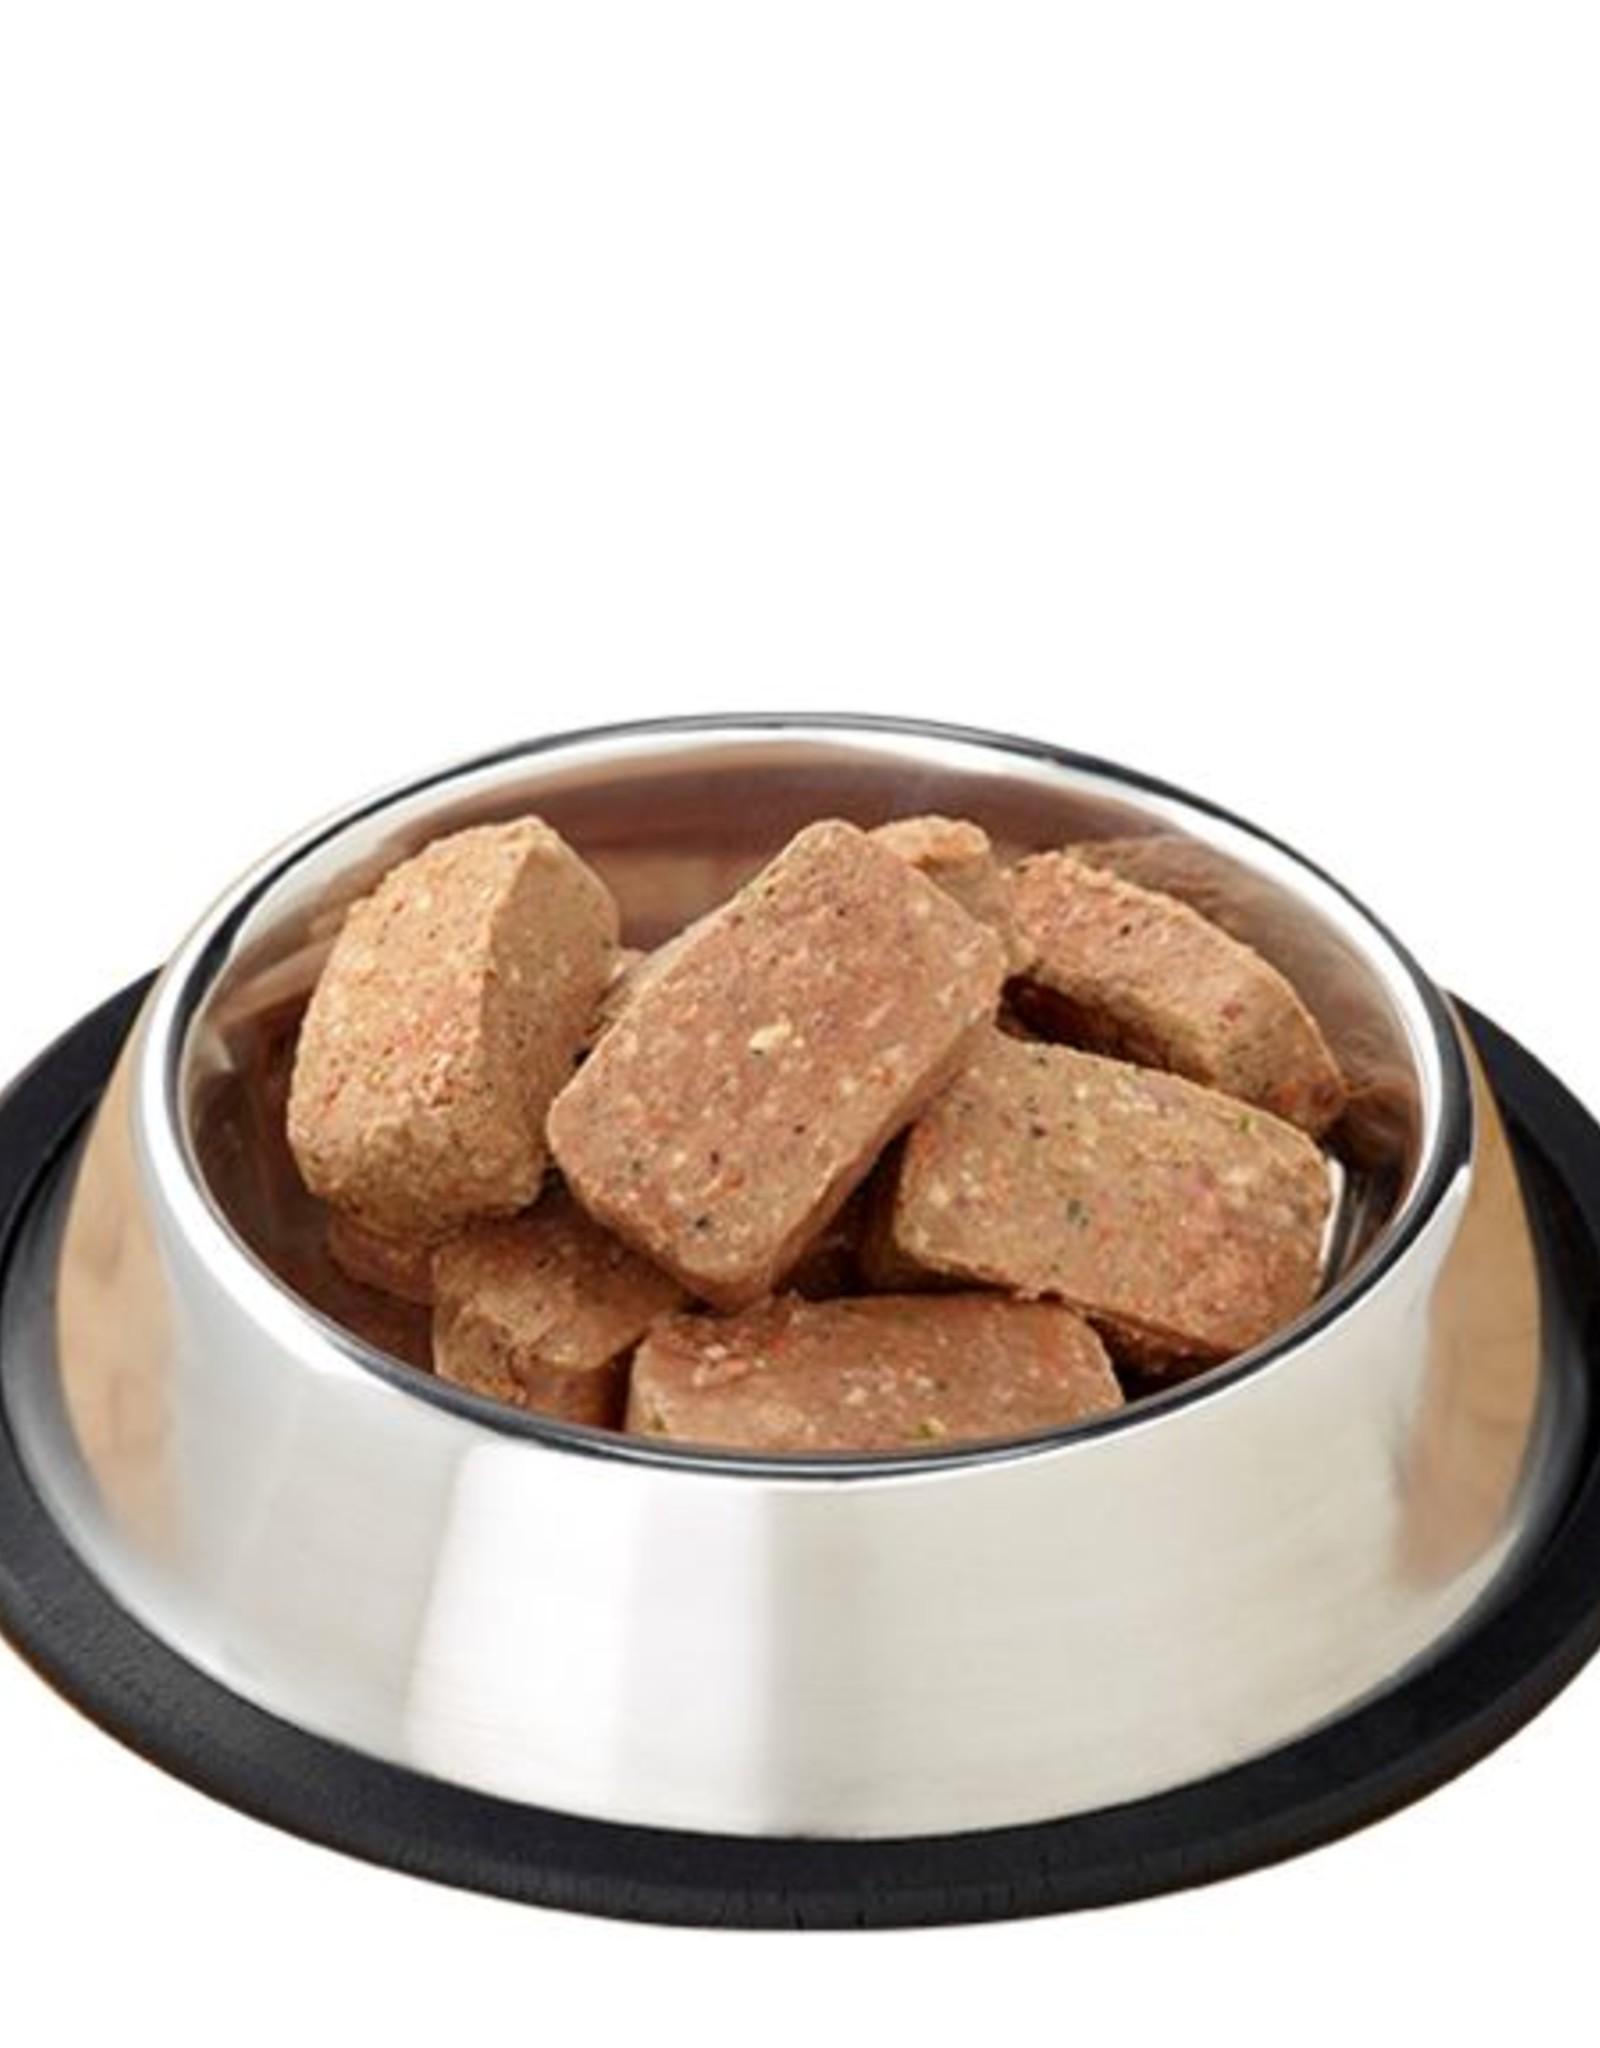 Primal Pet Food Primal Canine Raw Frozen Pork